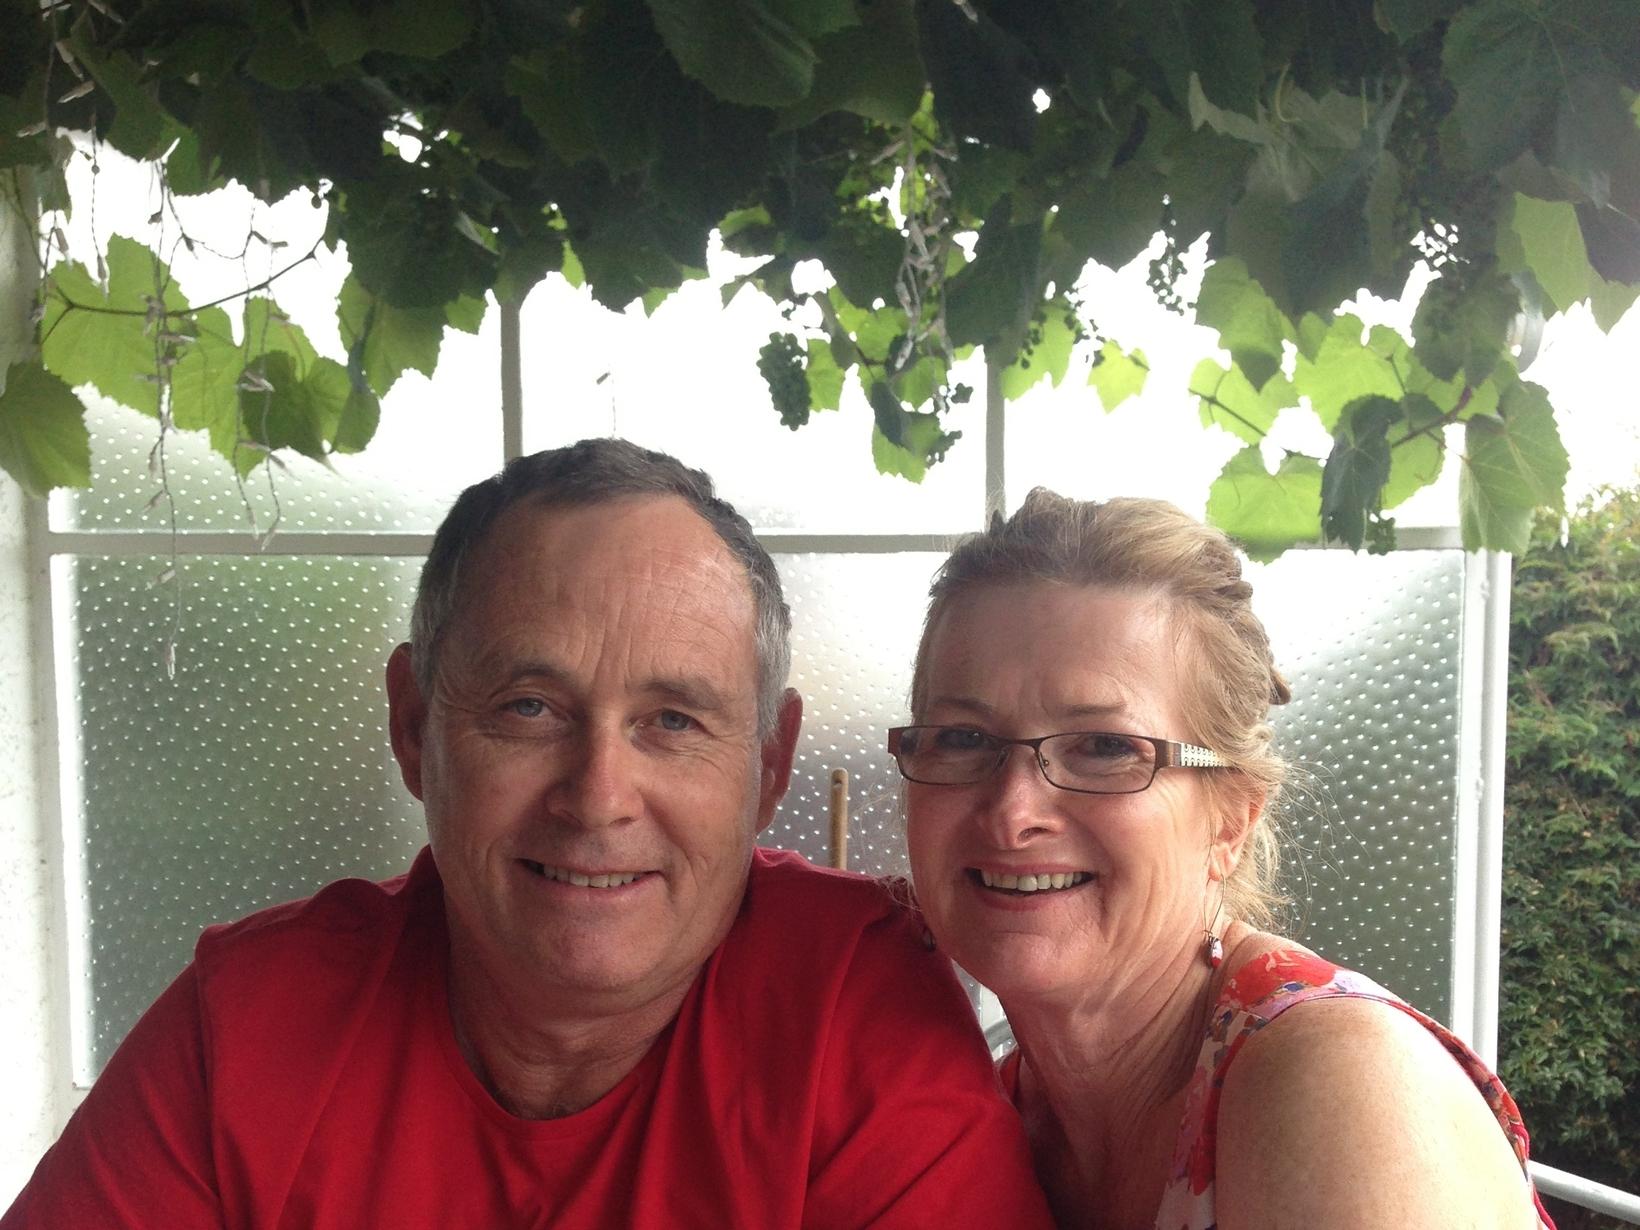 Jessie & Steve from Christchurch, New Zealand